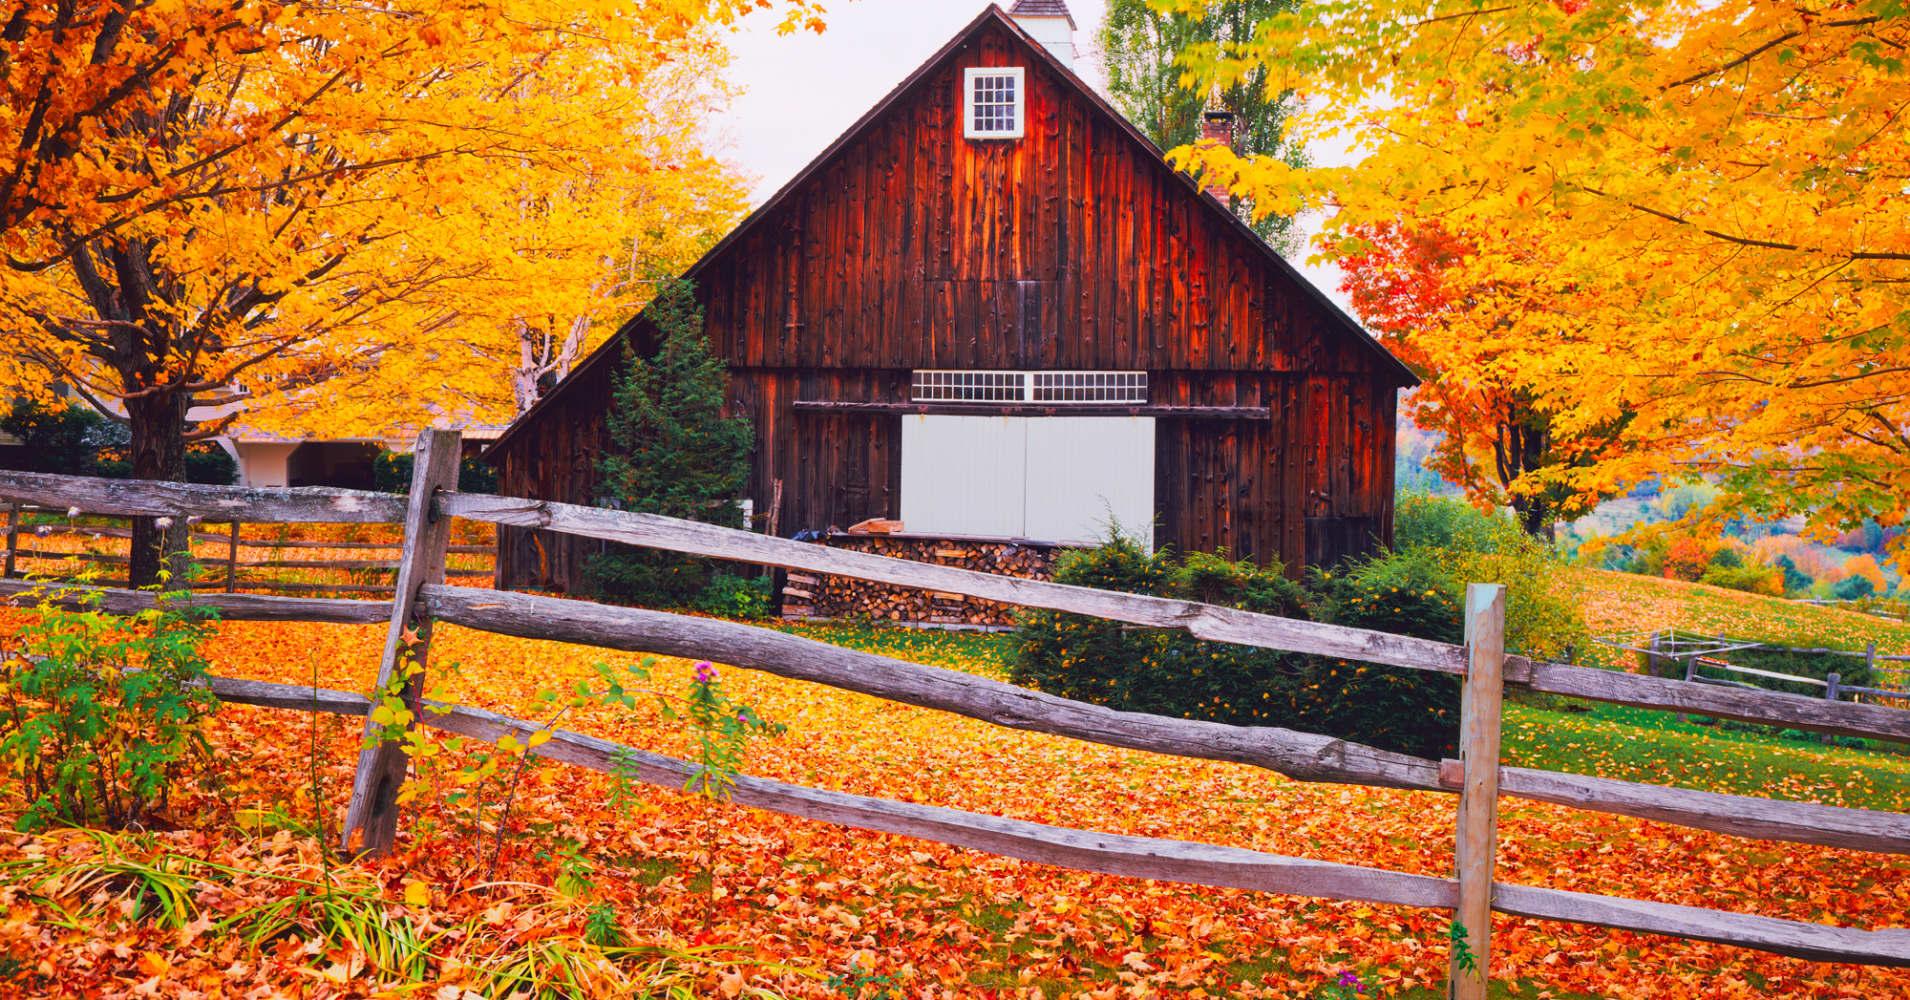 Autumn scene in Vermont.